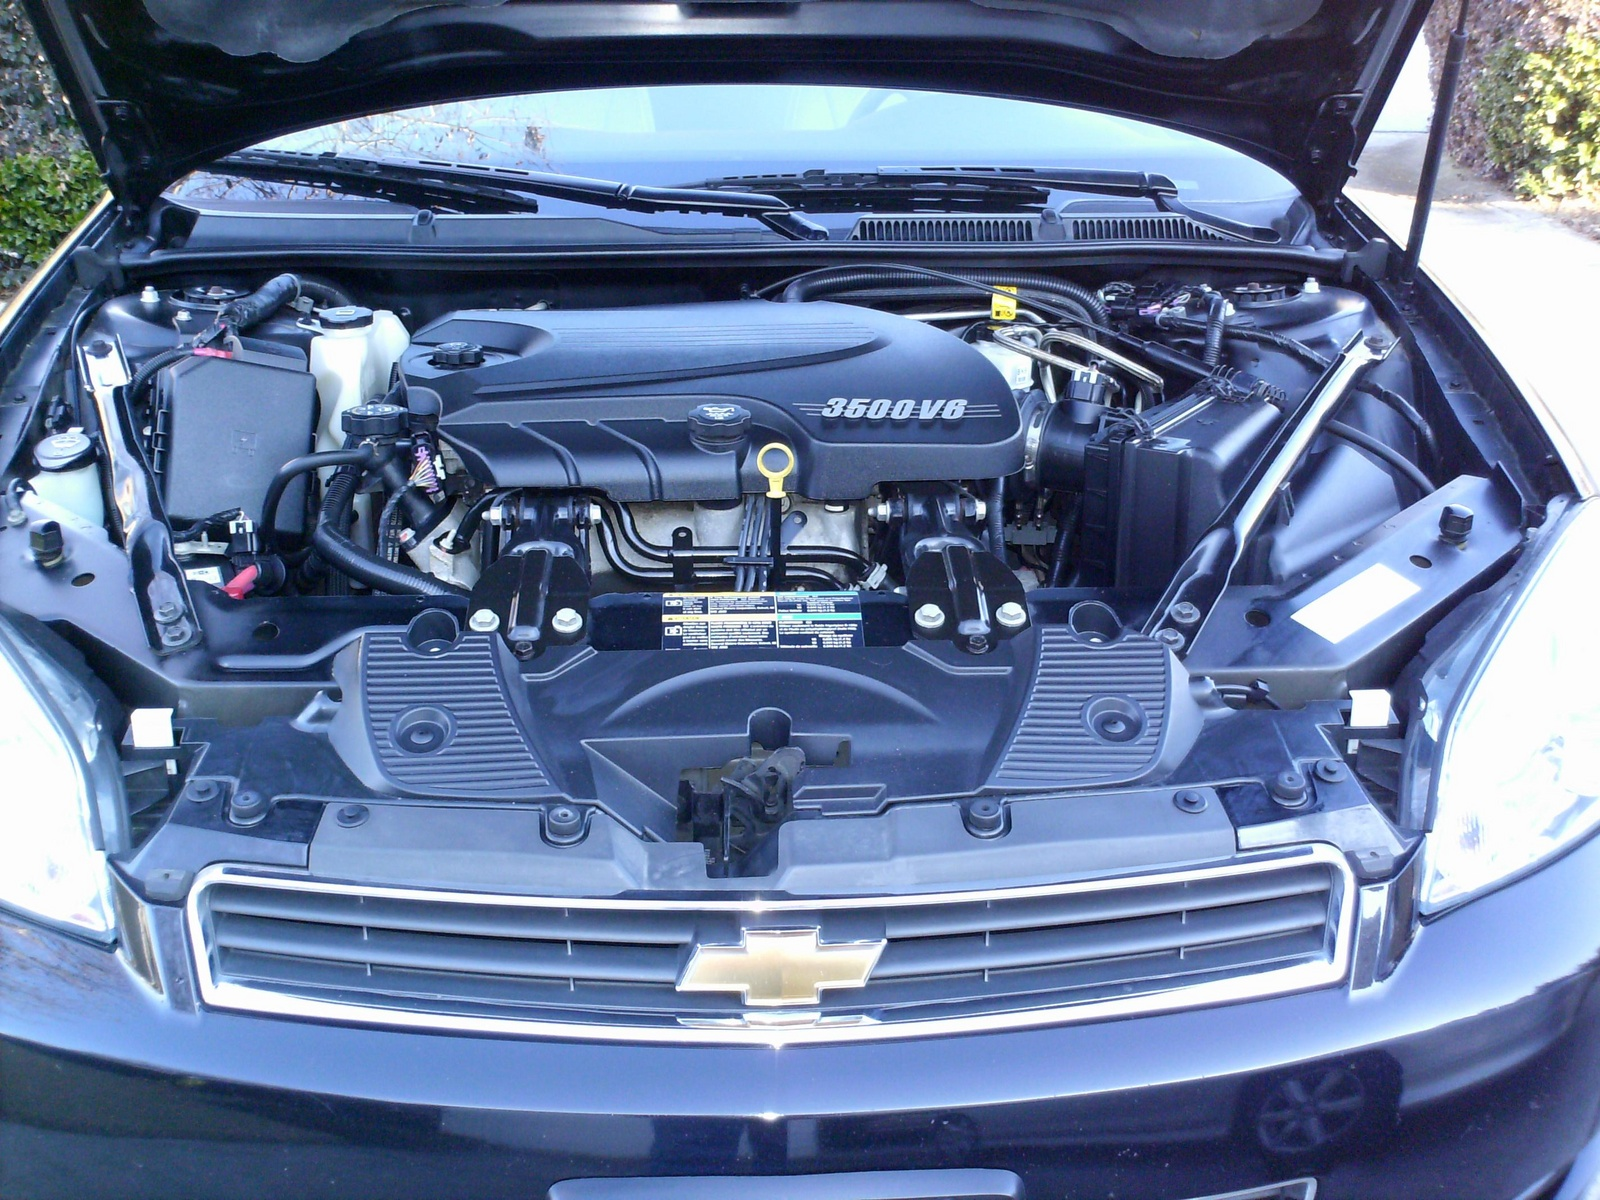 2008 Chevrolet Impala Ss Yahoo Autos.html | Autos Weblog